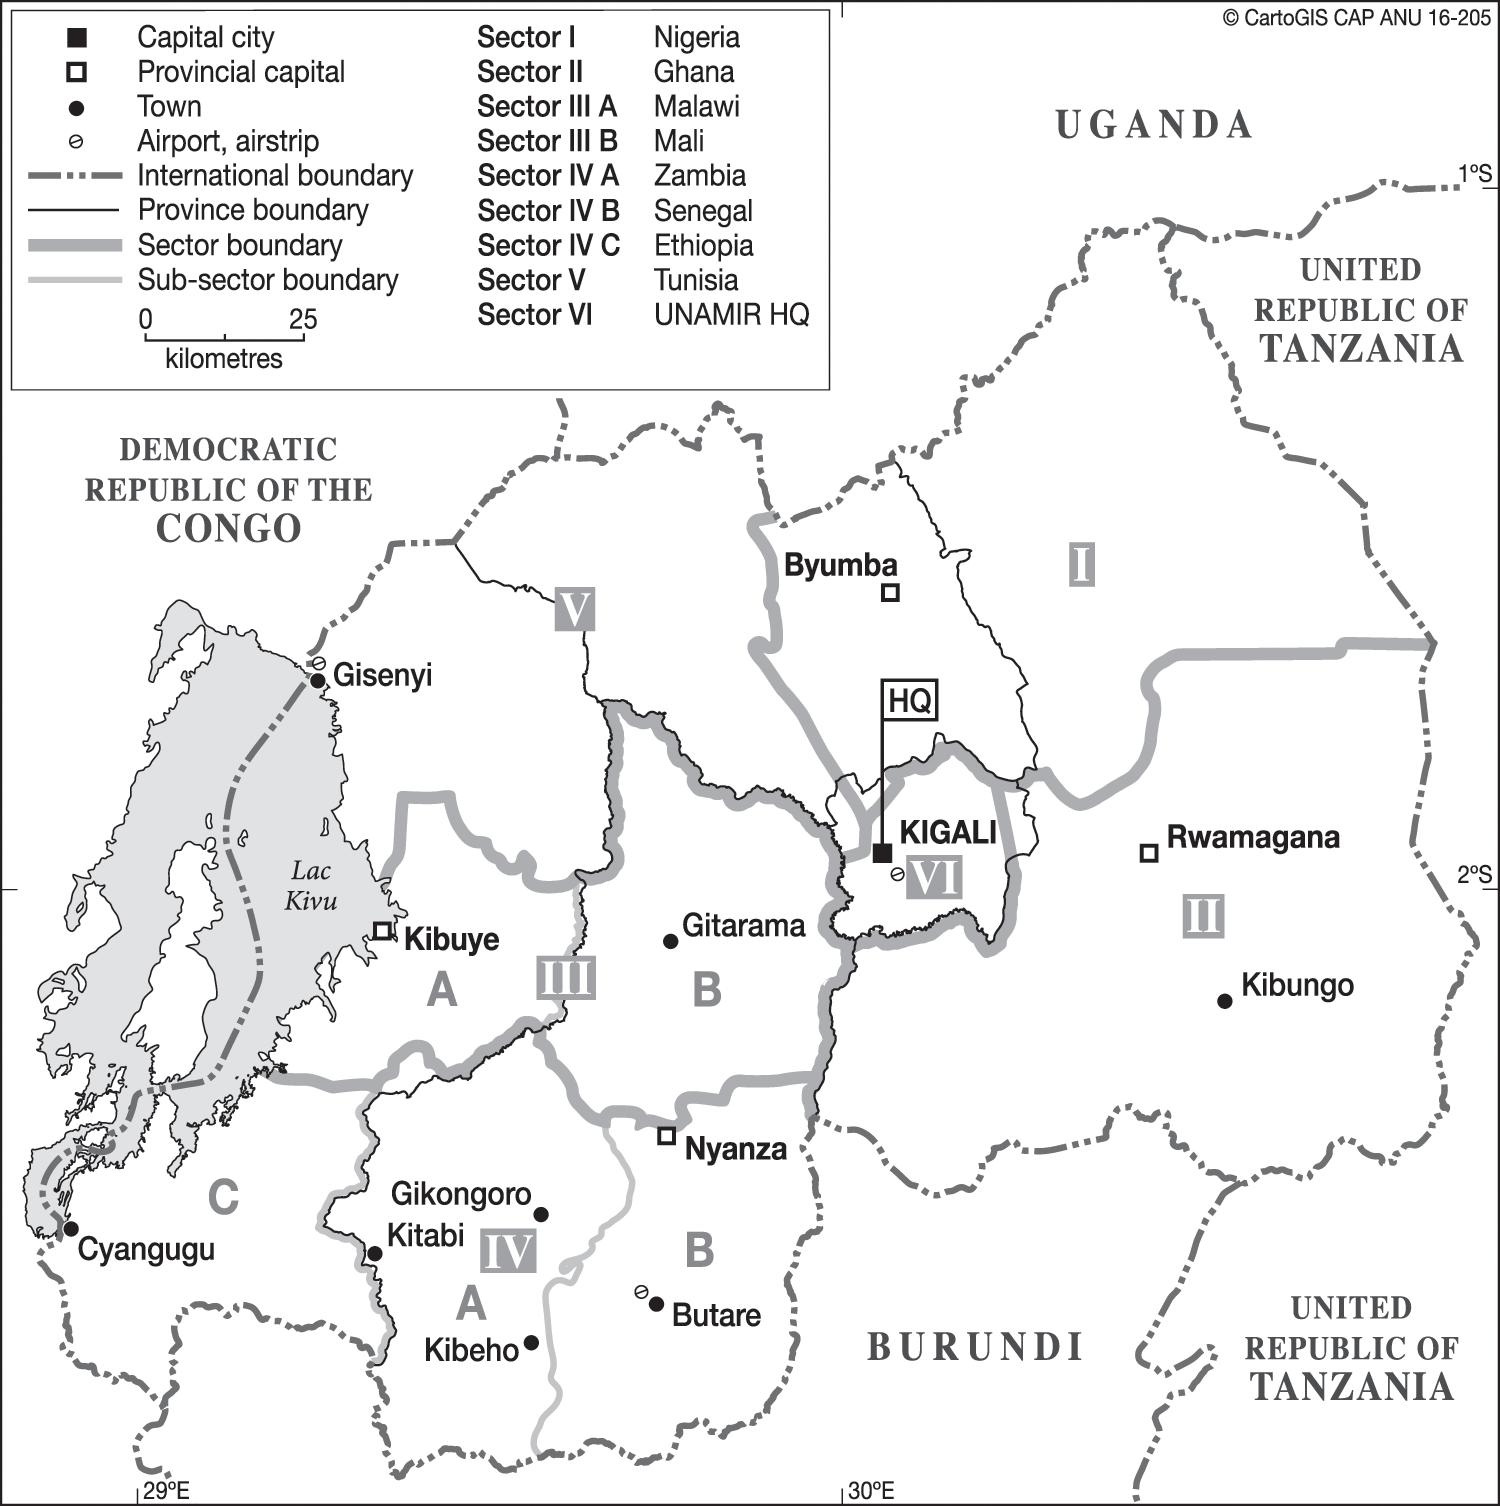 Rwanda (Part 2) - The Limits of Peacekeeping